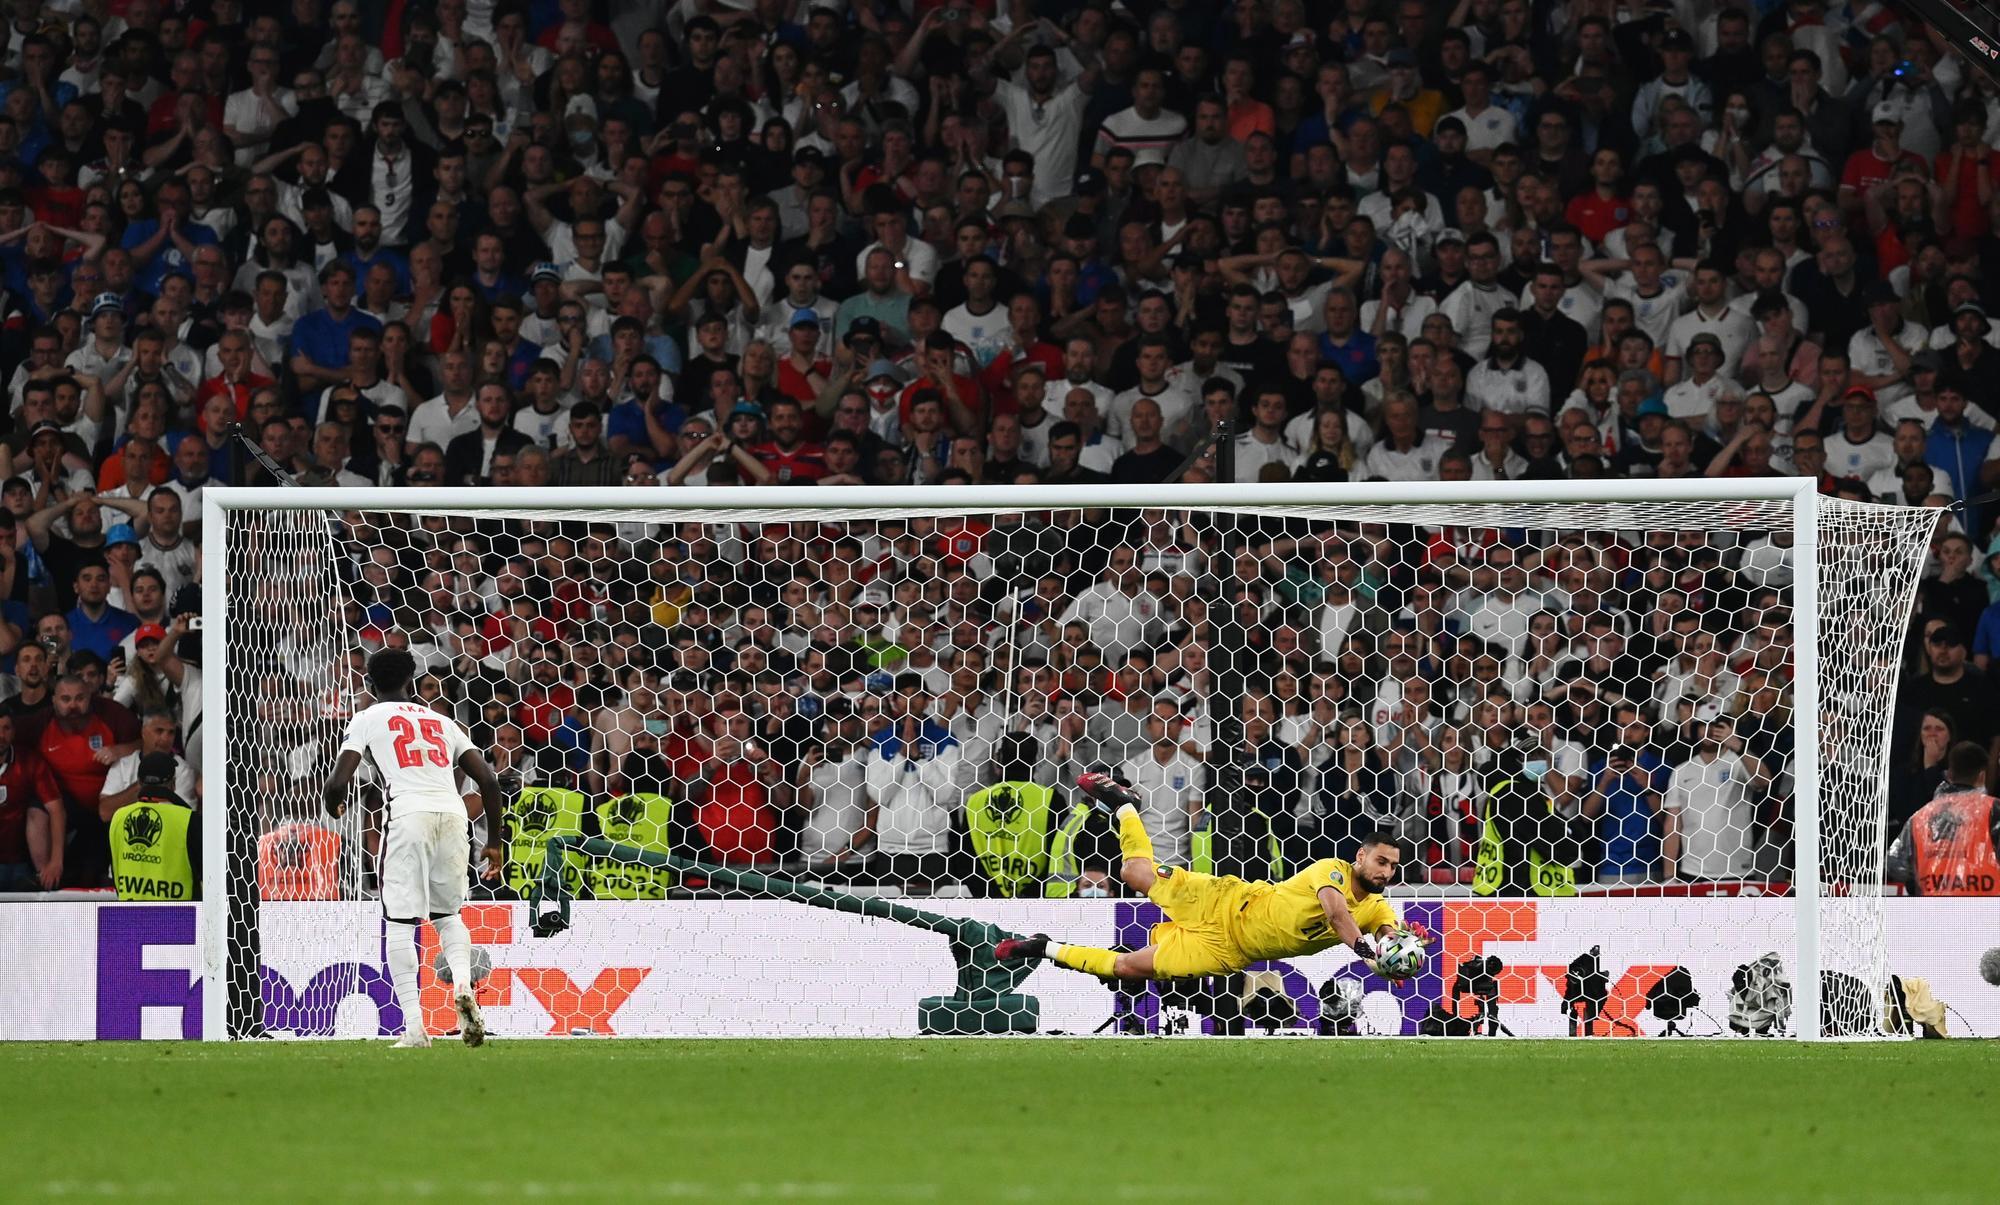 penaltis-1.jpg